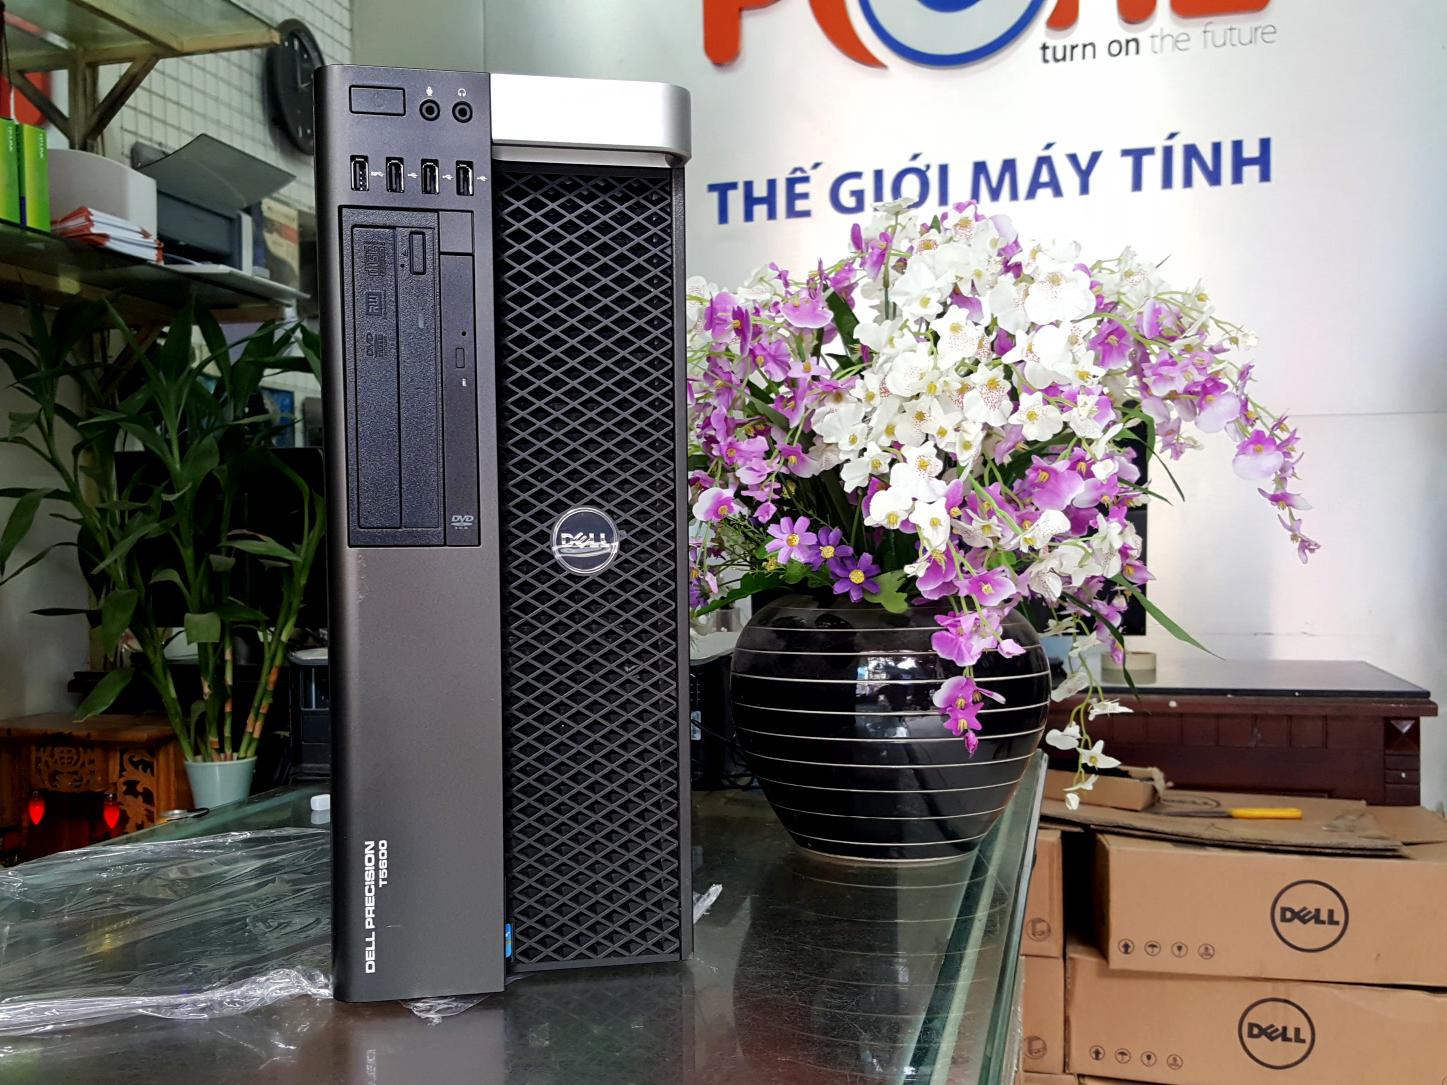 Dell Precision T3600 Cấu hình 1